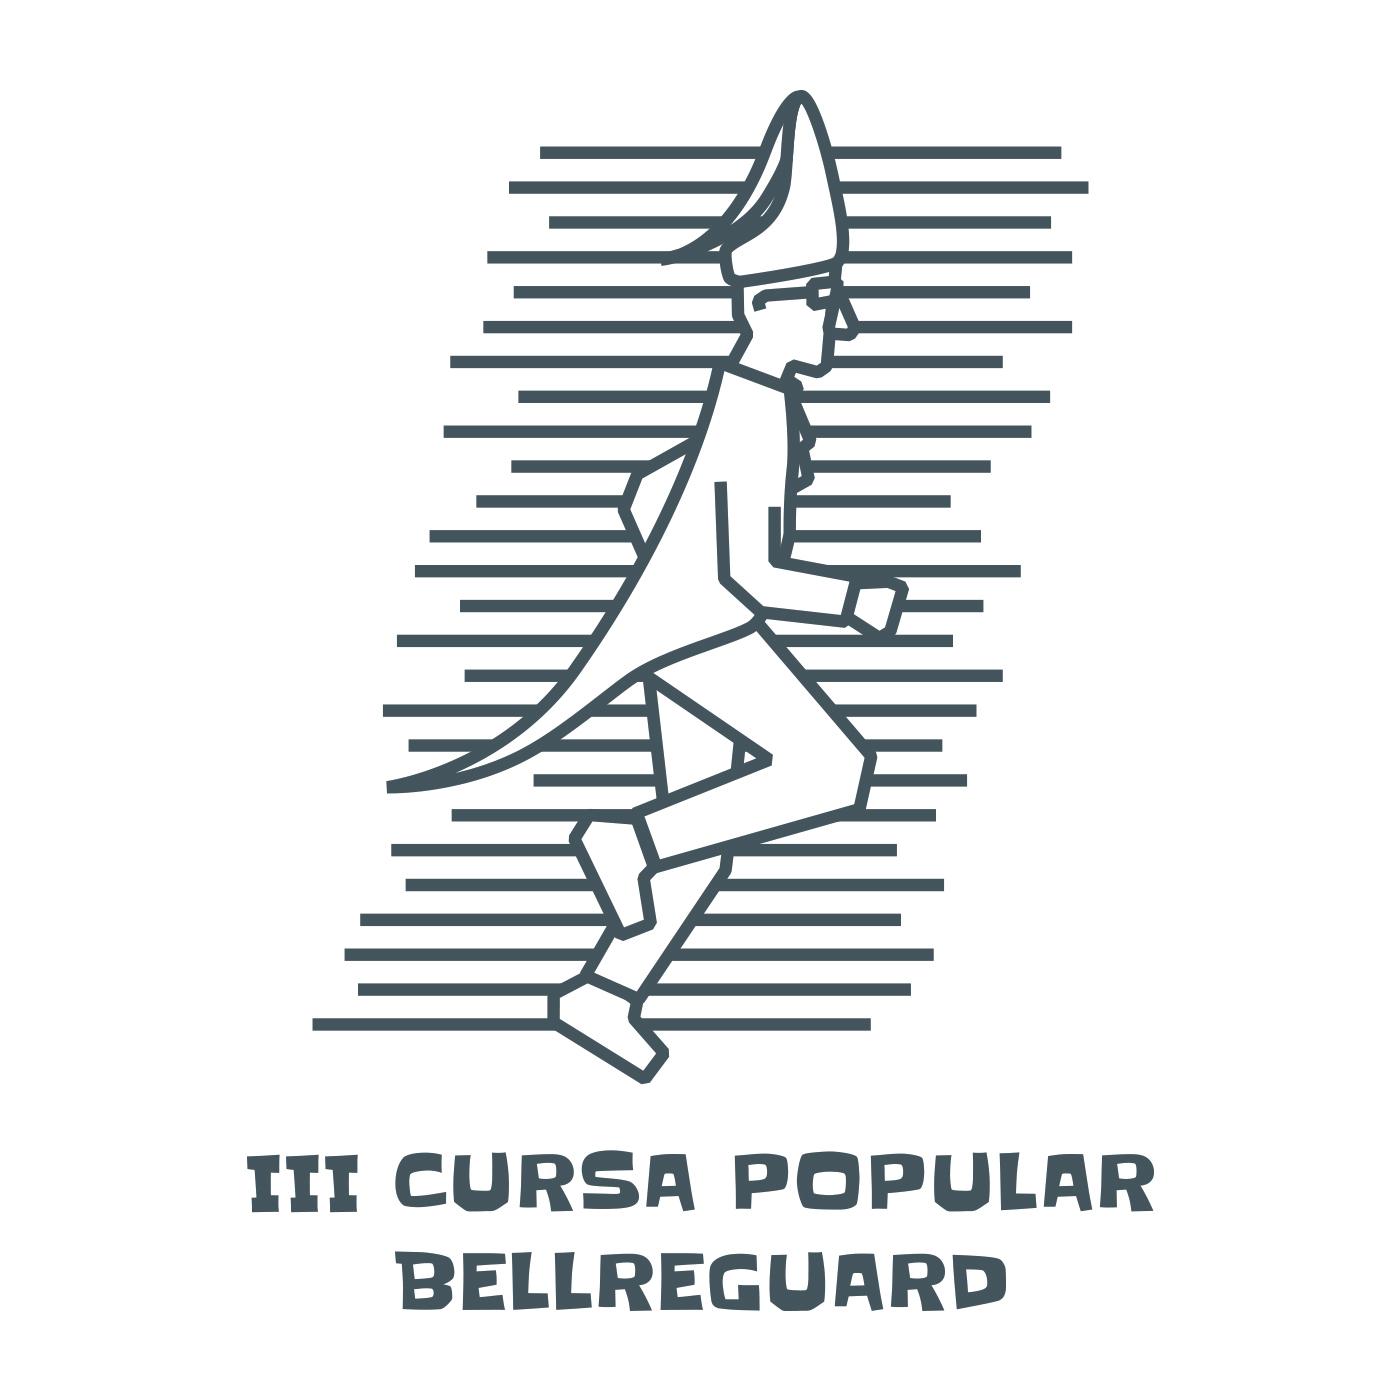 III Cursa Popular Bellreguard